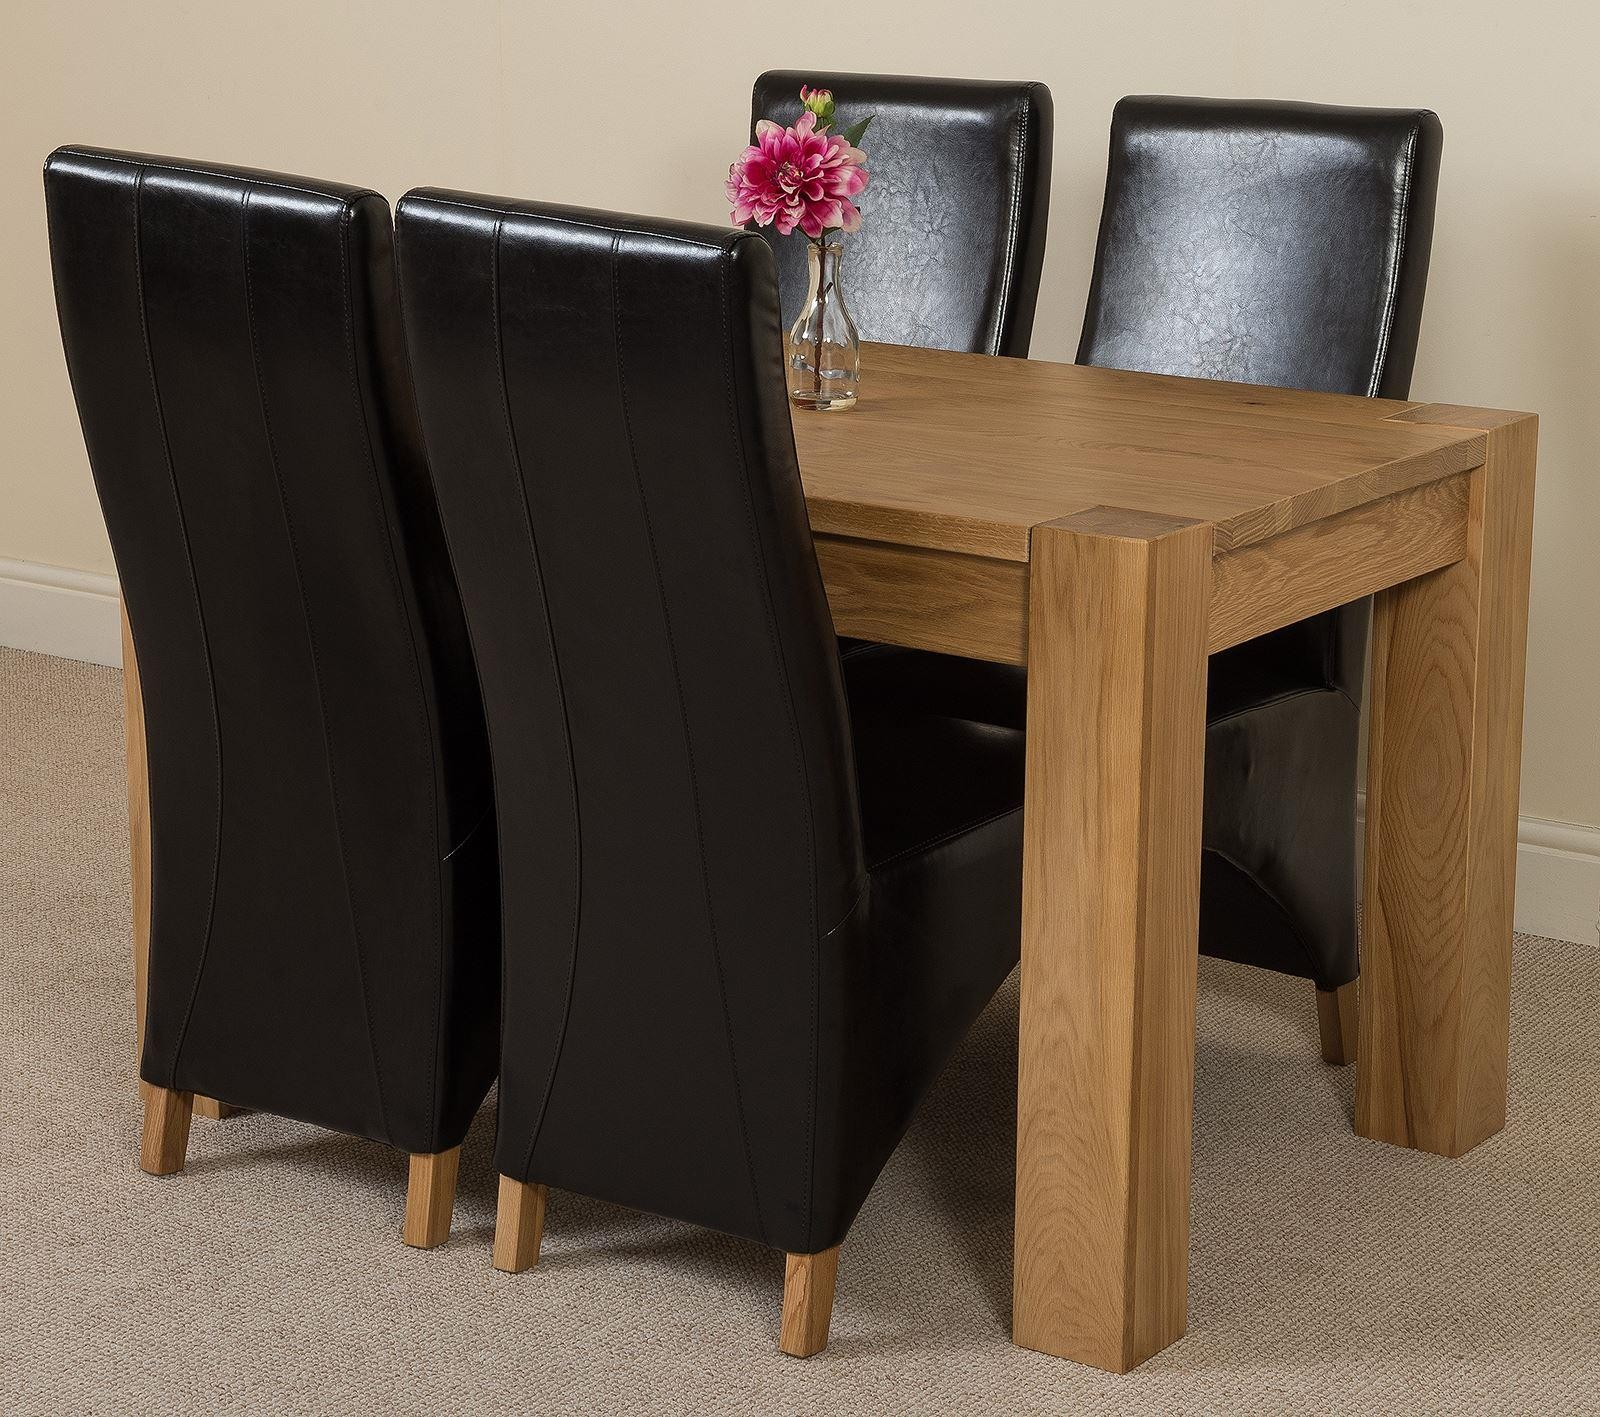 Kuba small dining set 4 brown chairs modern furniture direct for Modern furniture direct